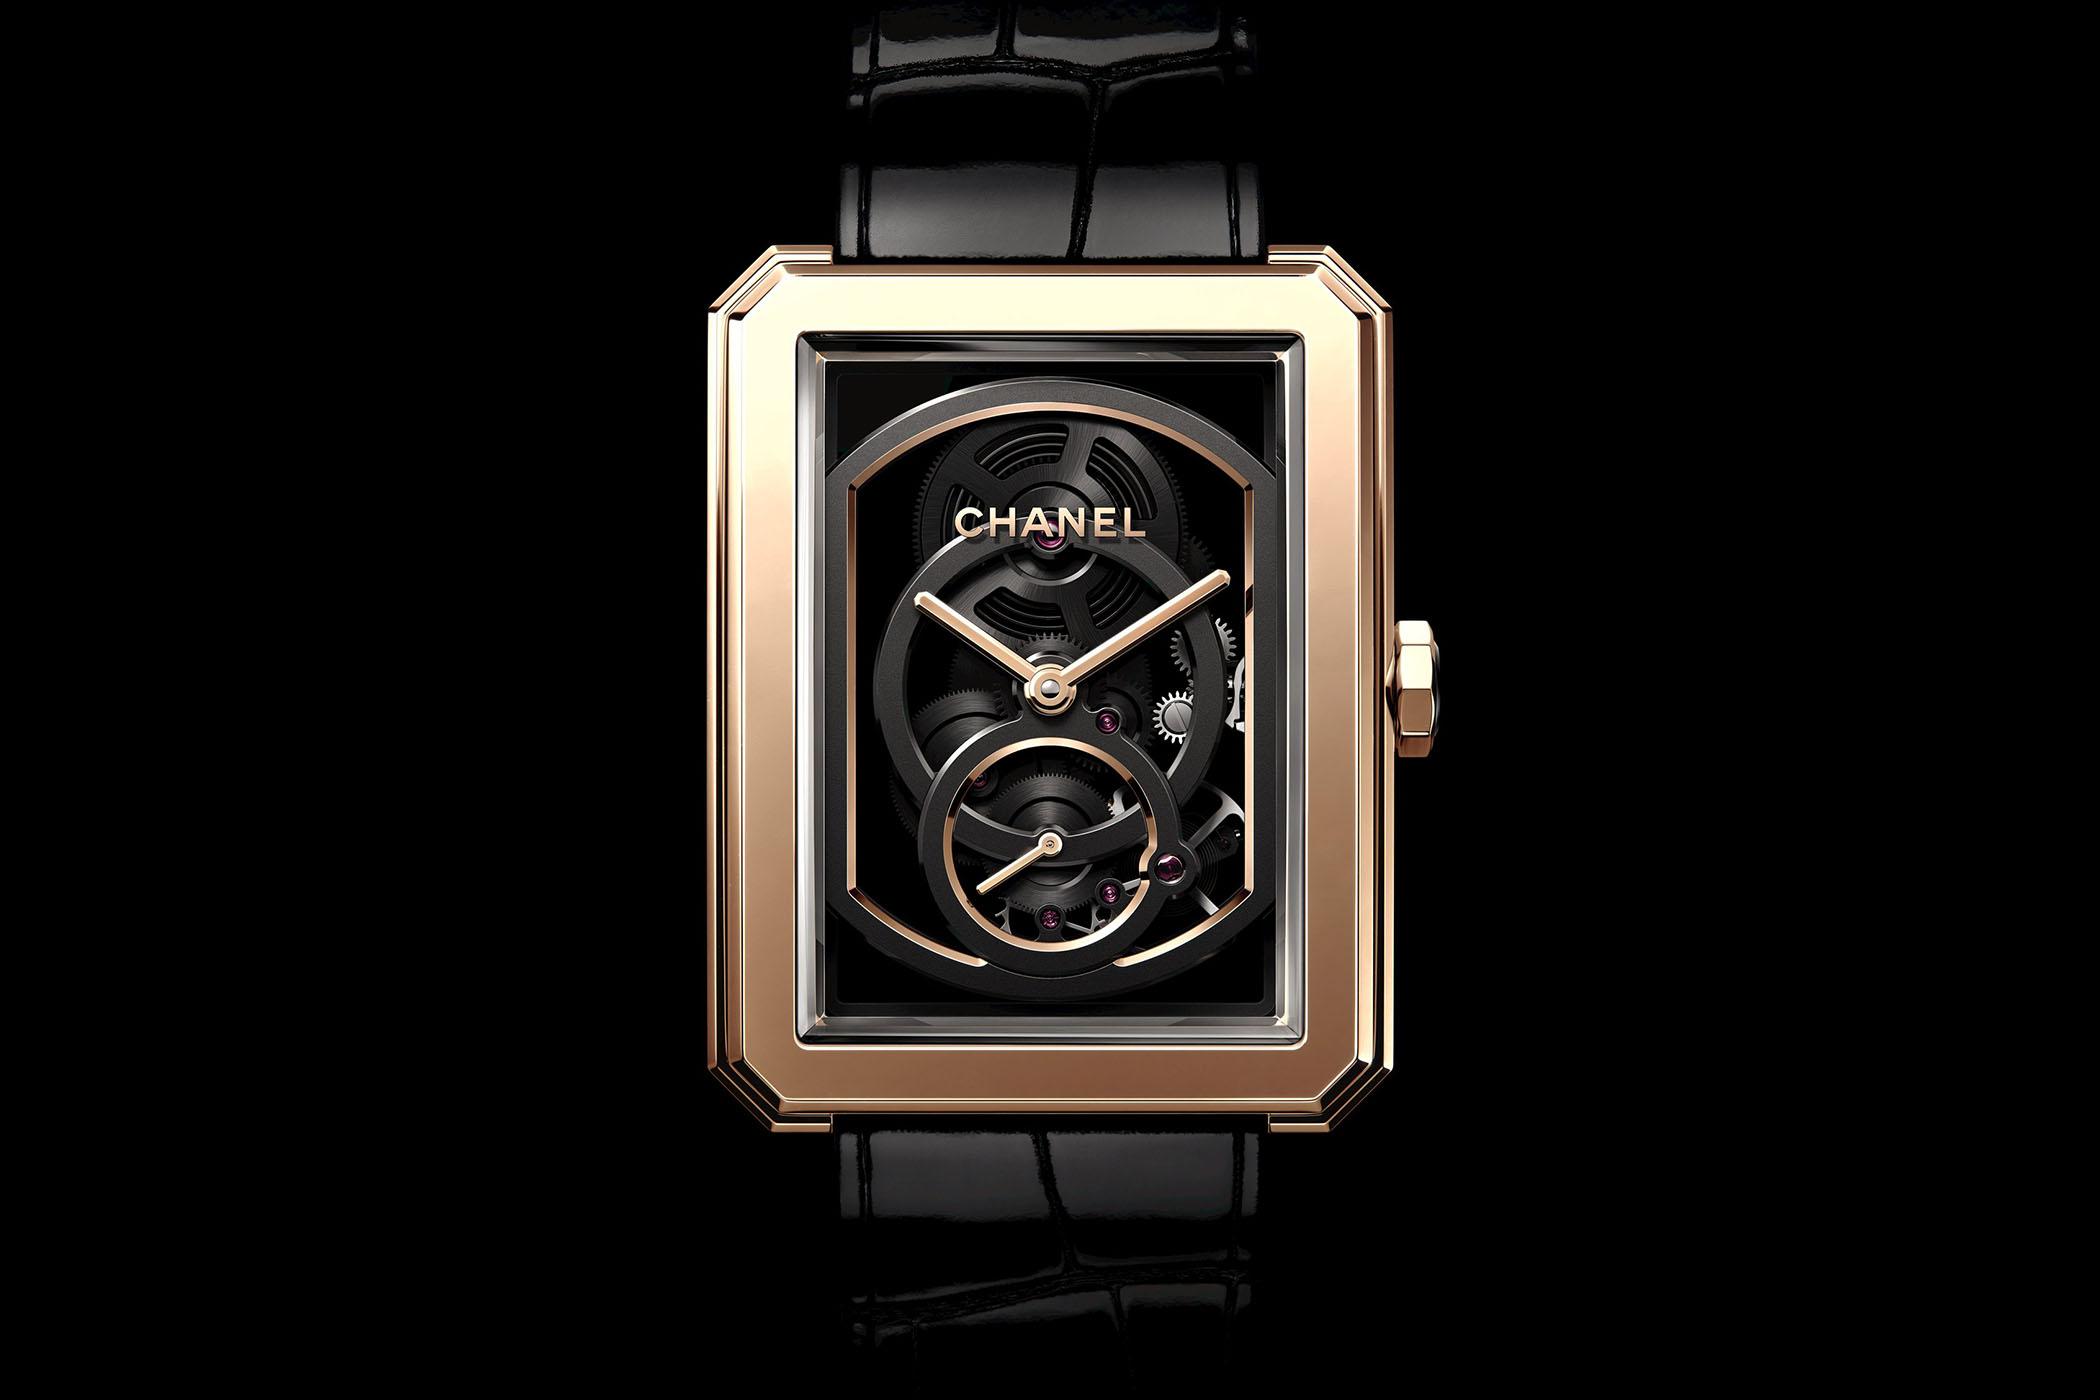 Chanel Boy-Friend Squelette - Baselworld 2018